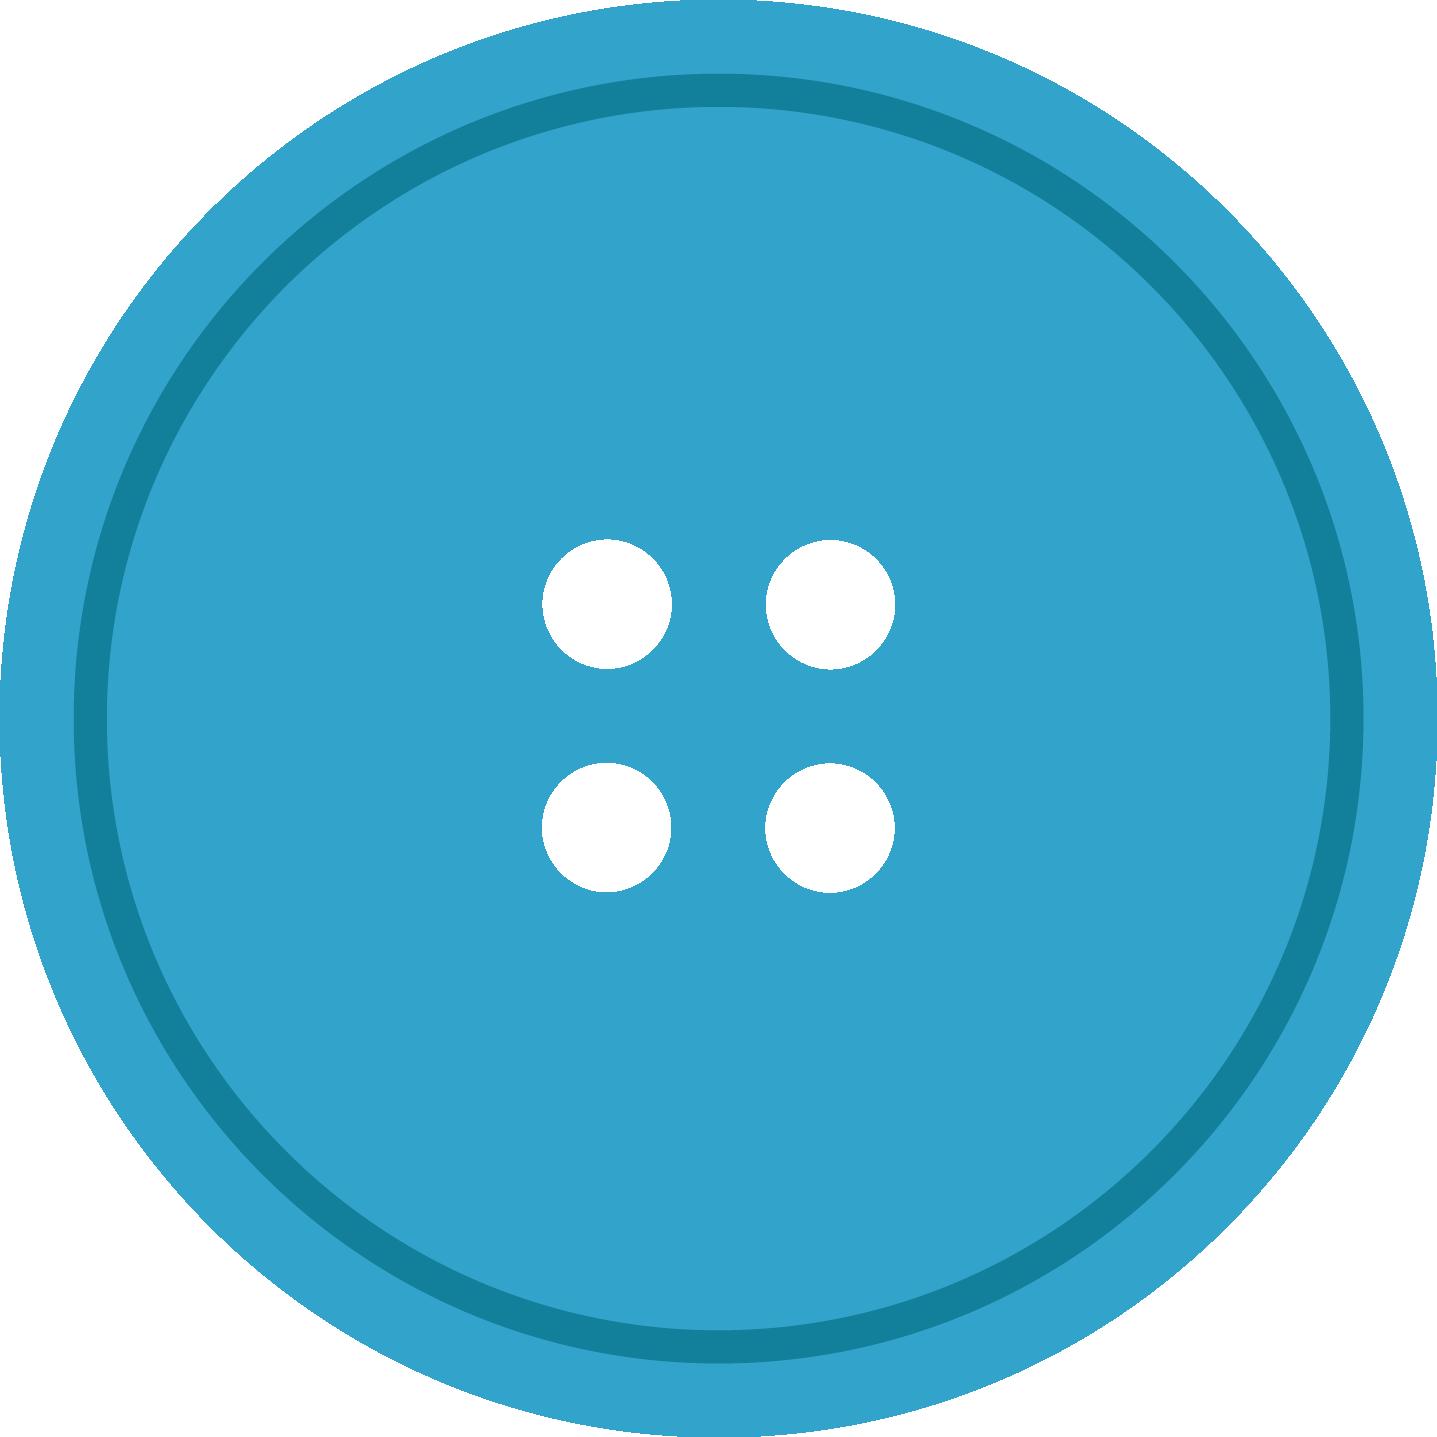 Blue round cloth button. Hole clipart transparent background